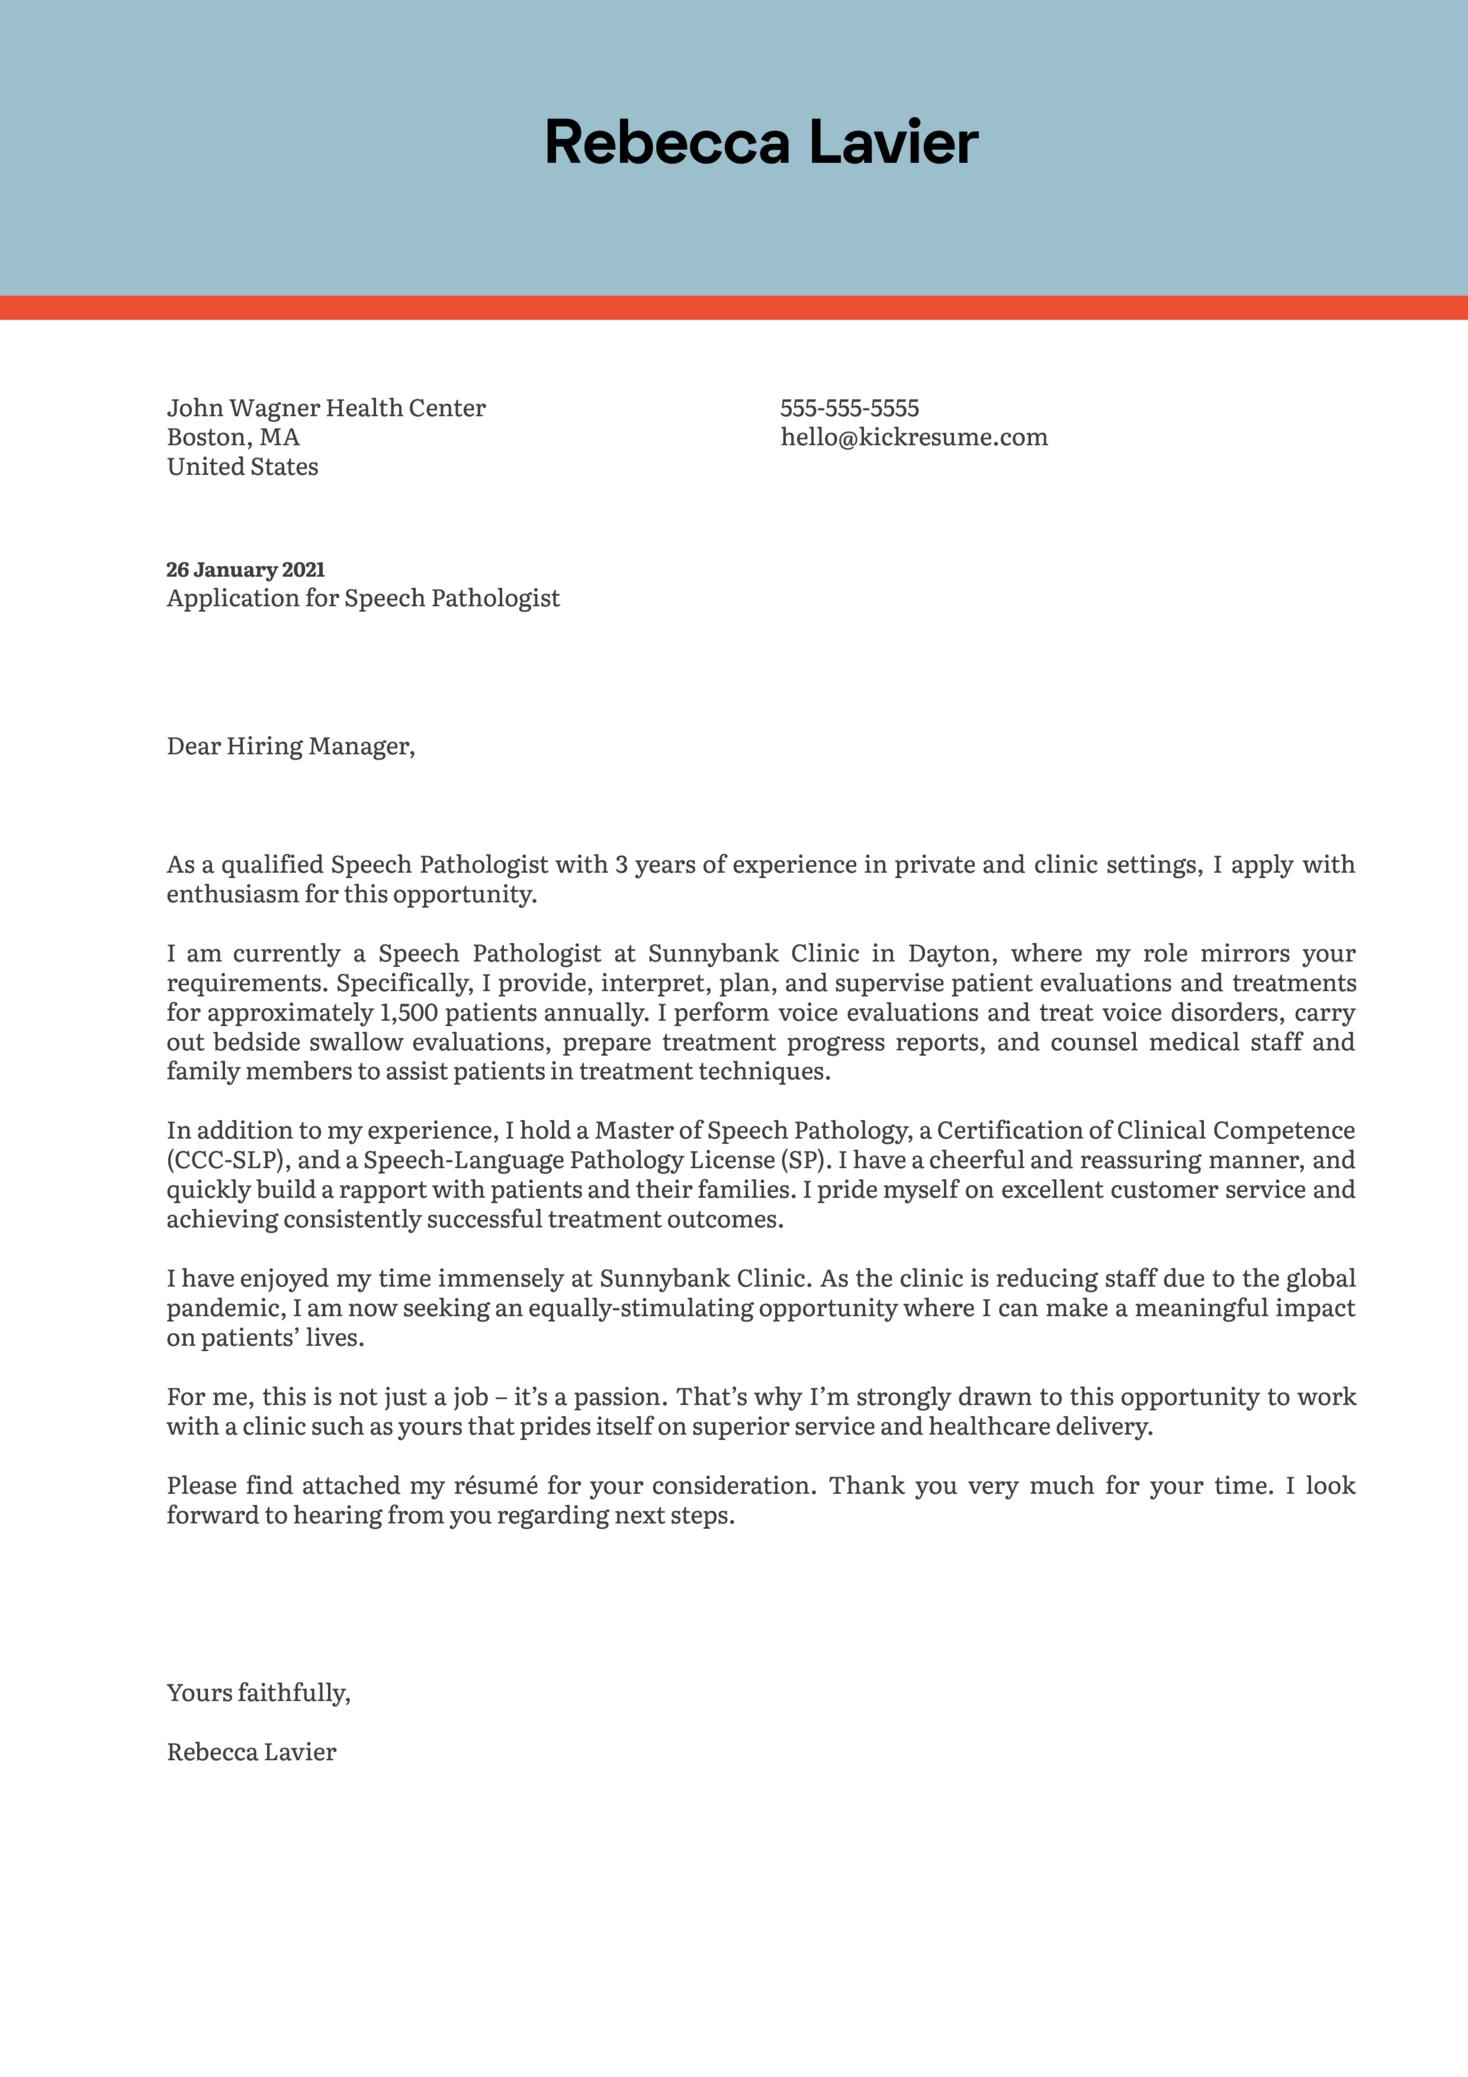 Speech Pathologist Cover Letter Template